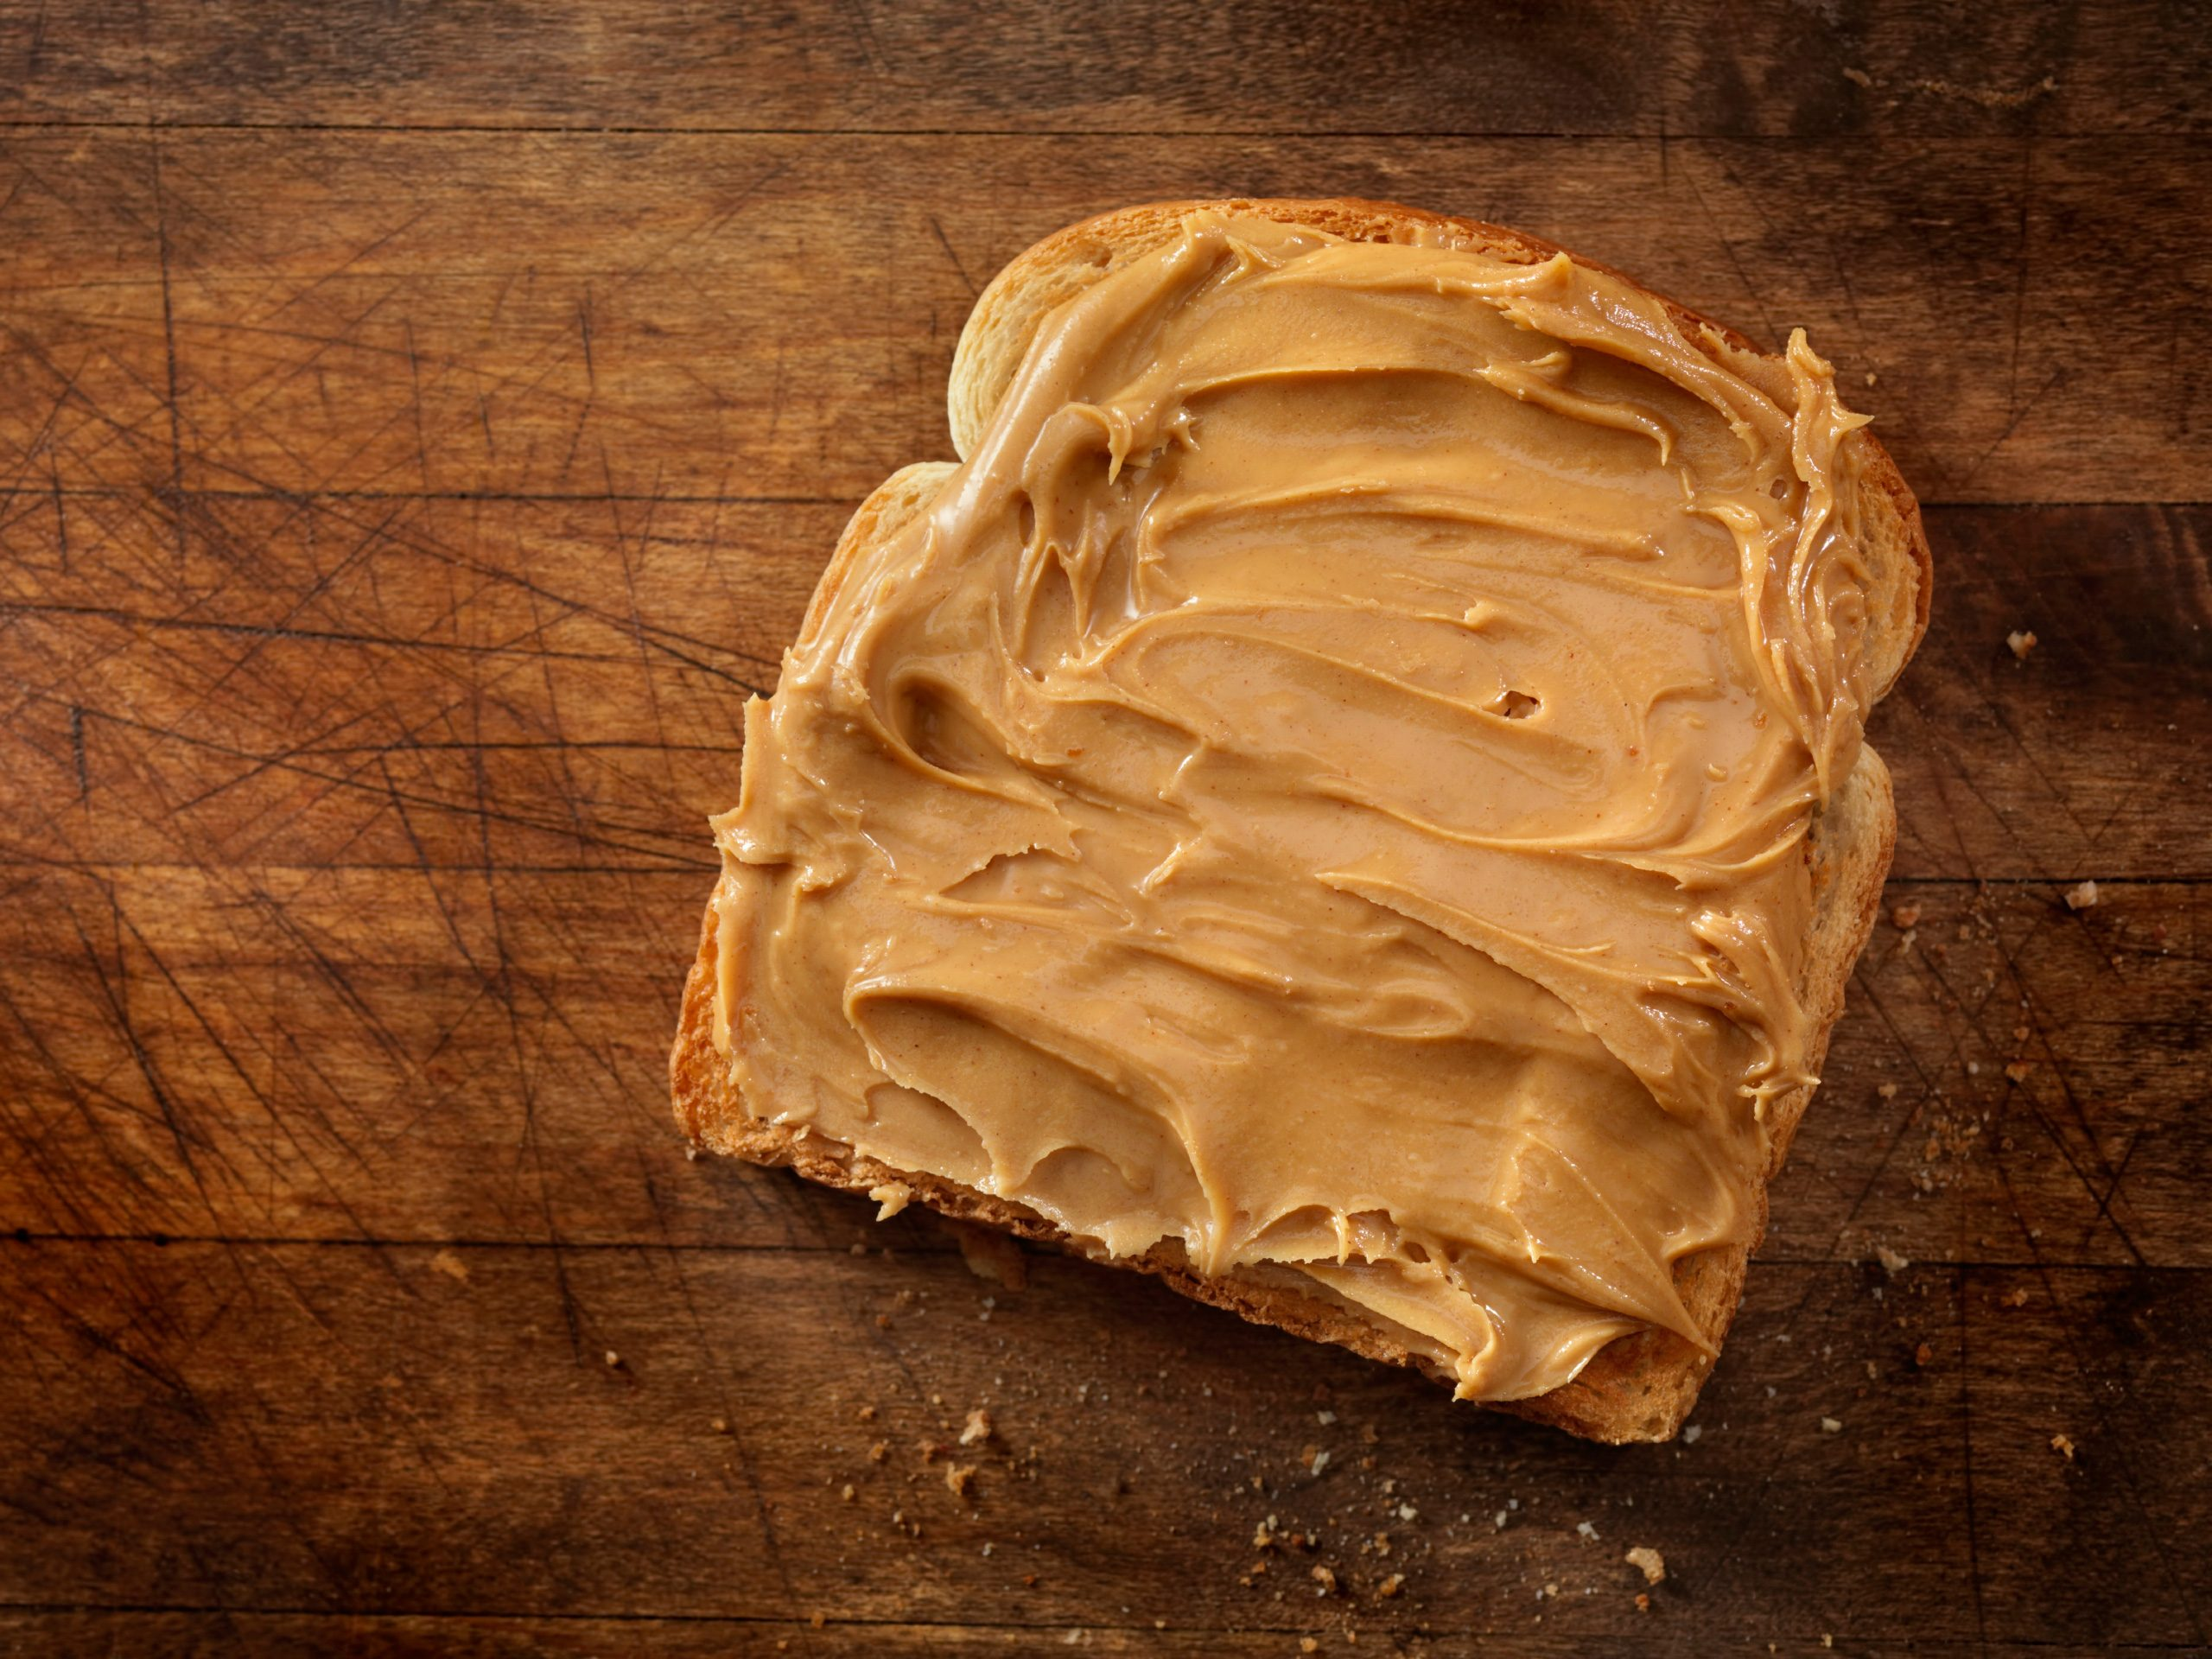 Reduced-Fat Peanut Butter